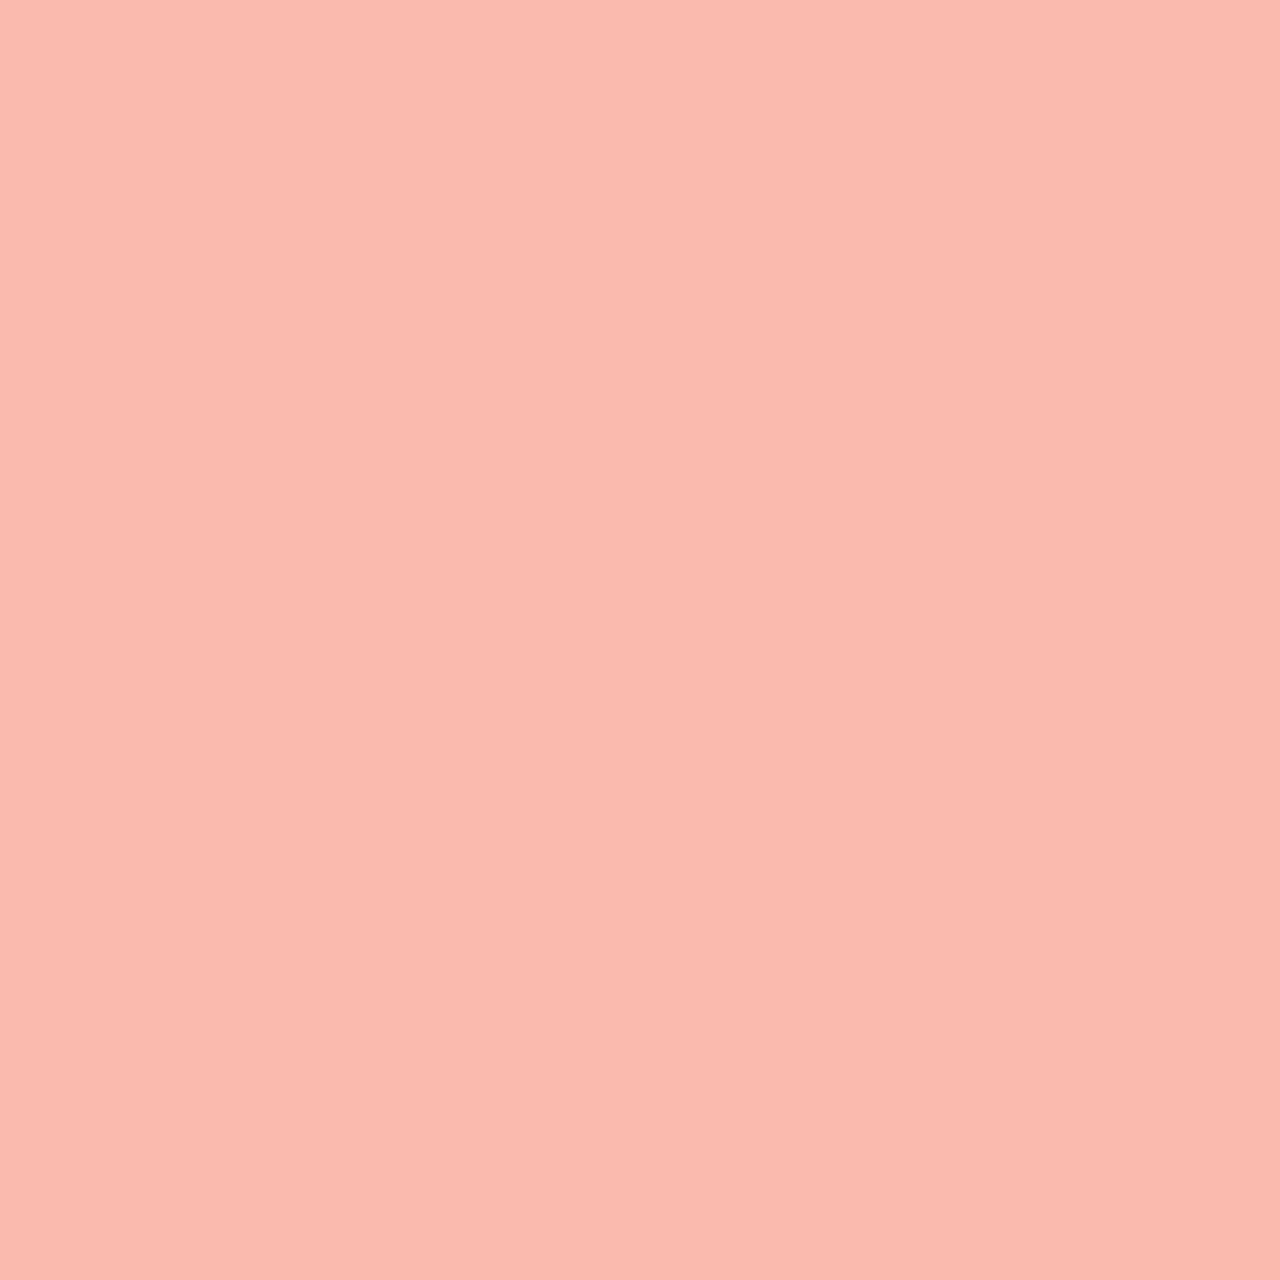 "#0305 Rosco Gels Roscolux Rose Gold, 20x24"""